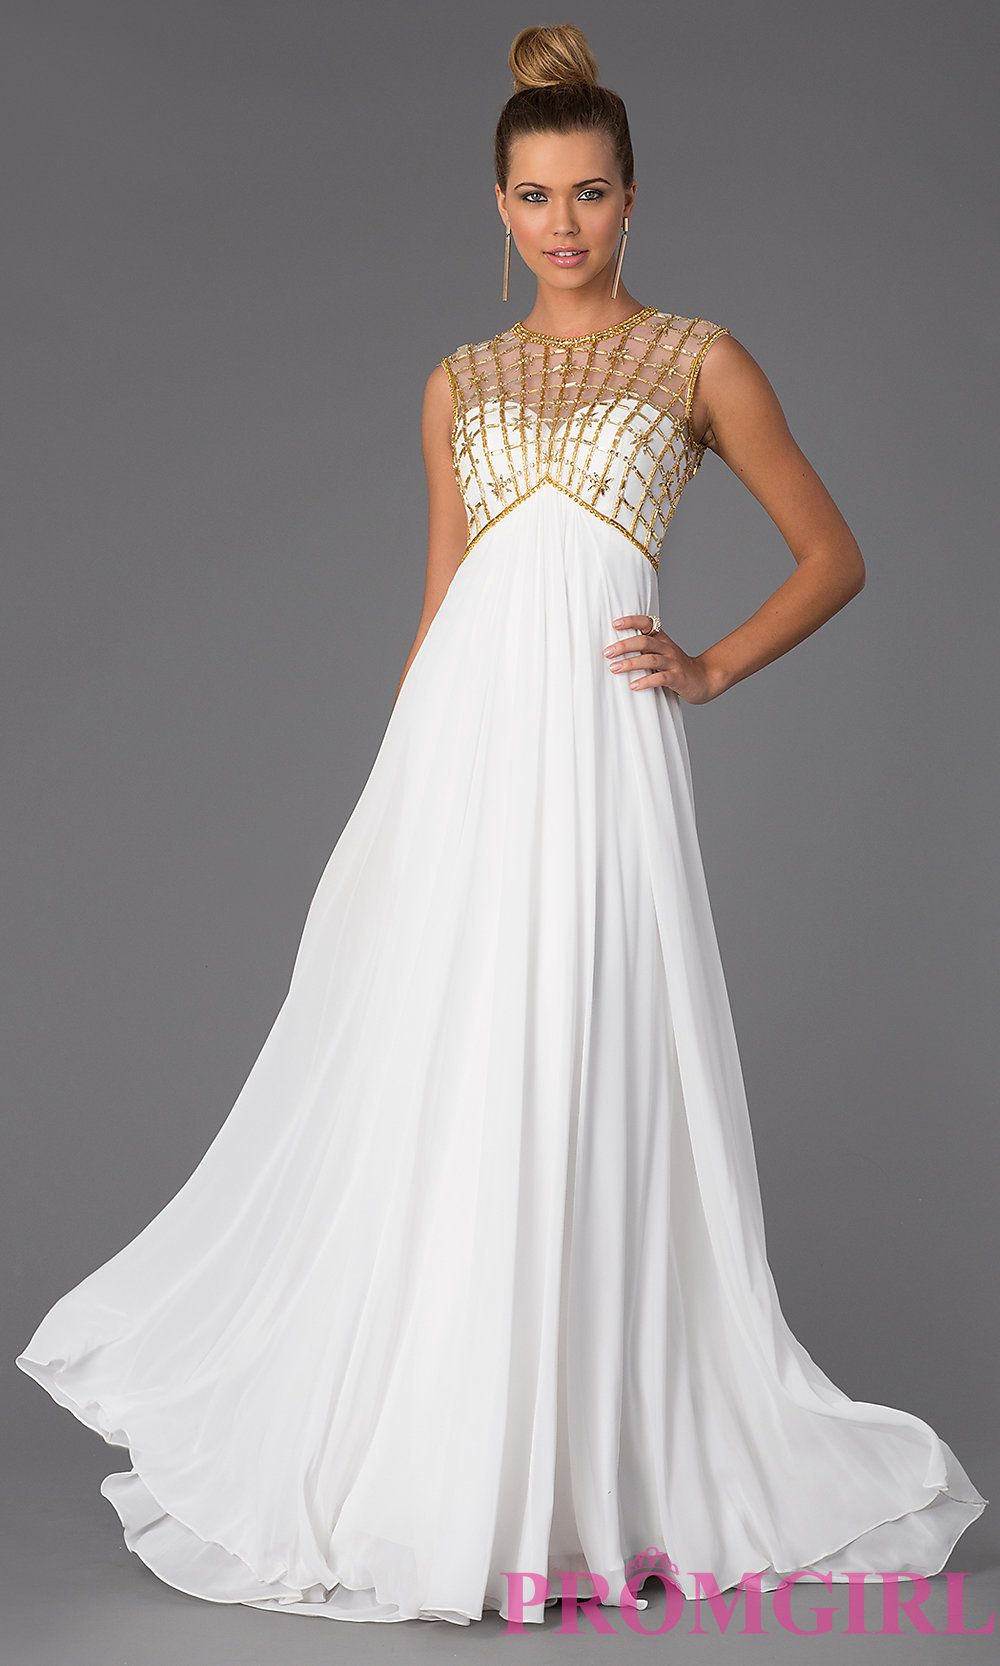 Prom Dresses Plus Size Dresses Prom Shoes High Neck